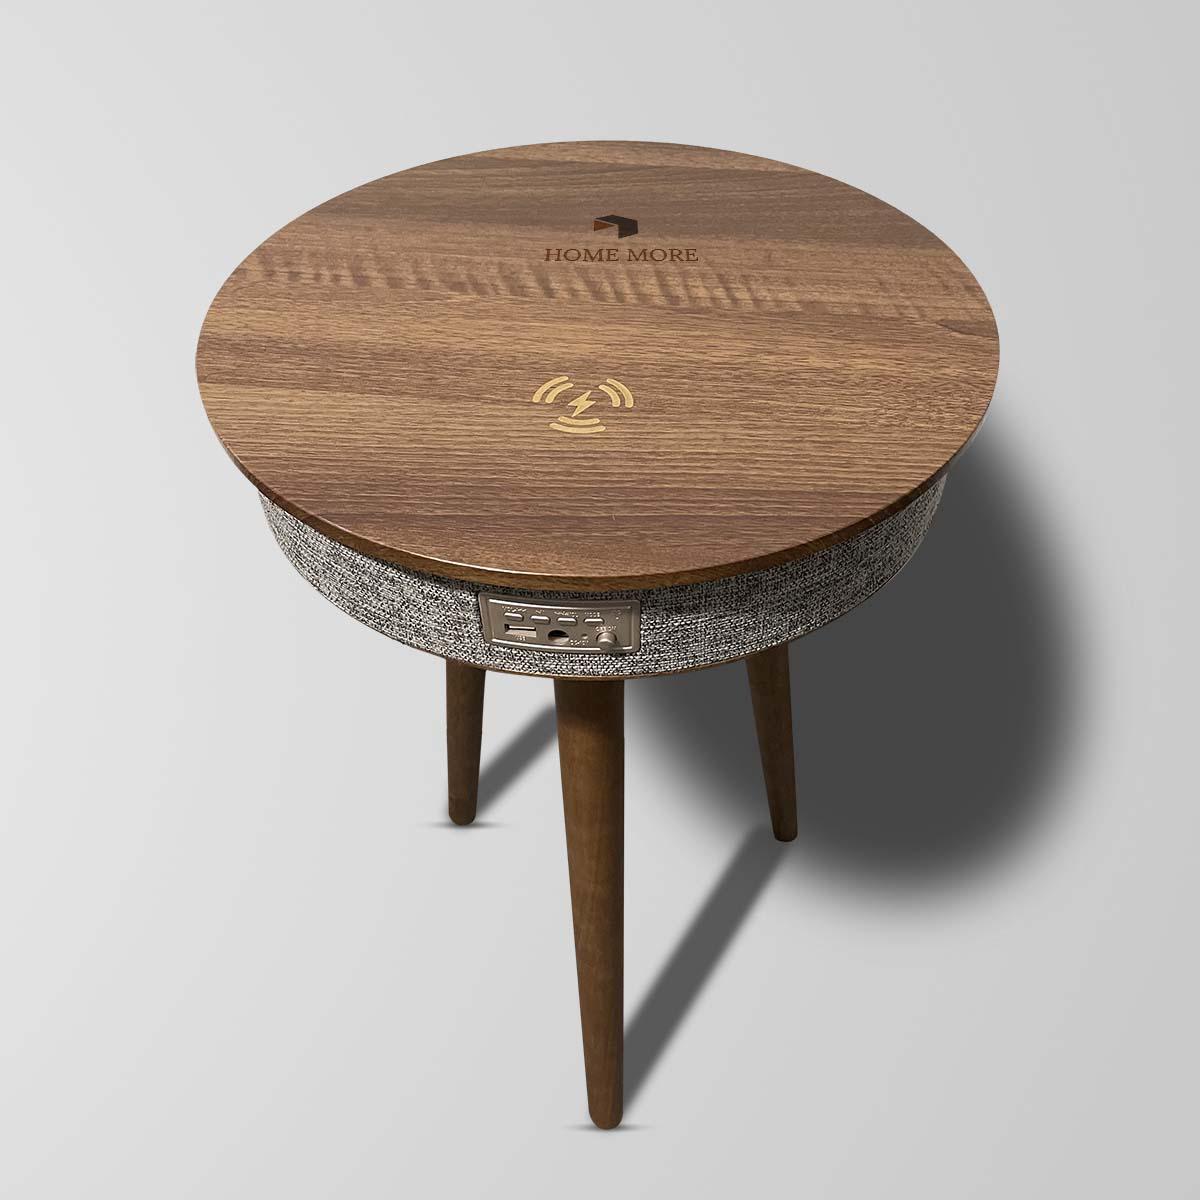 Smart modern design nordic style luxury bedroom living room home furniture bluetooth speaker designer coffee table